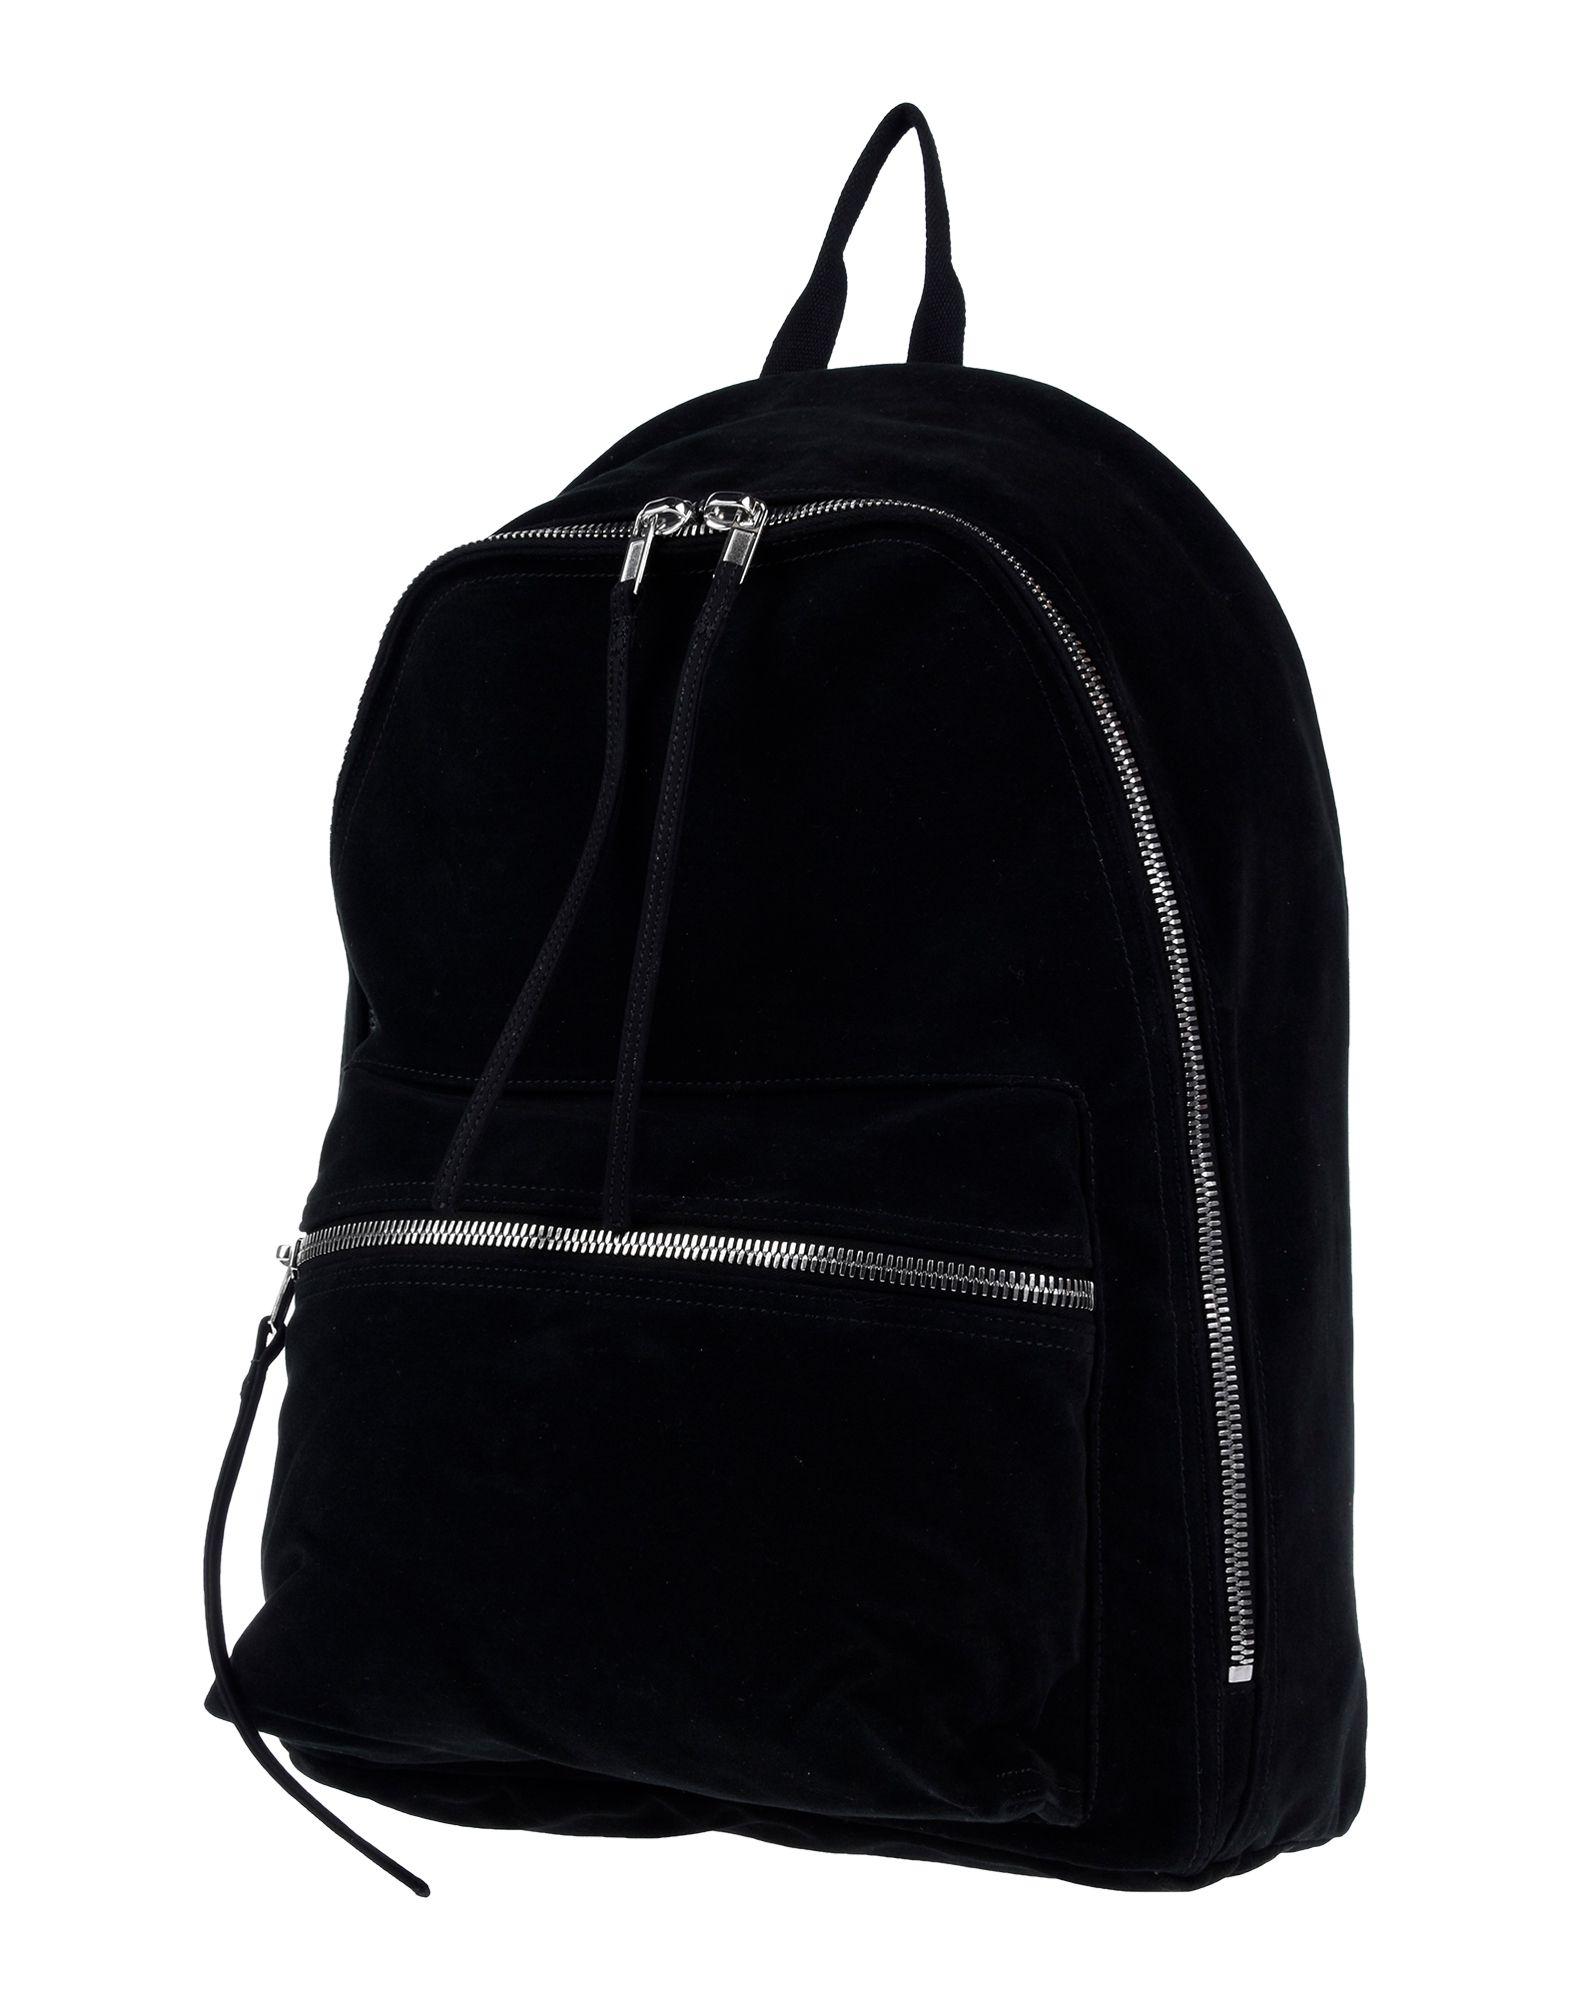 Rick Owens Drkshdw Backpacks BACKPACKS & FANNY PACKS